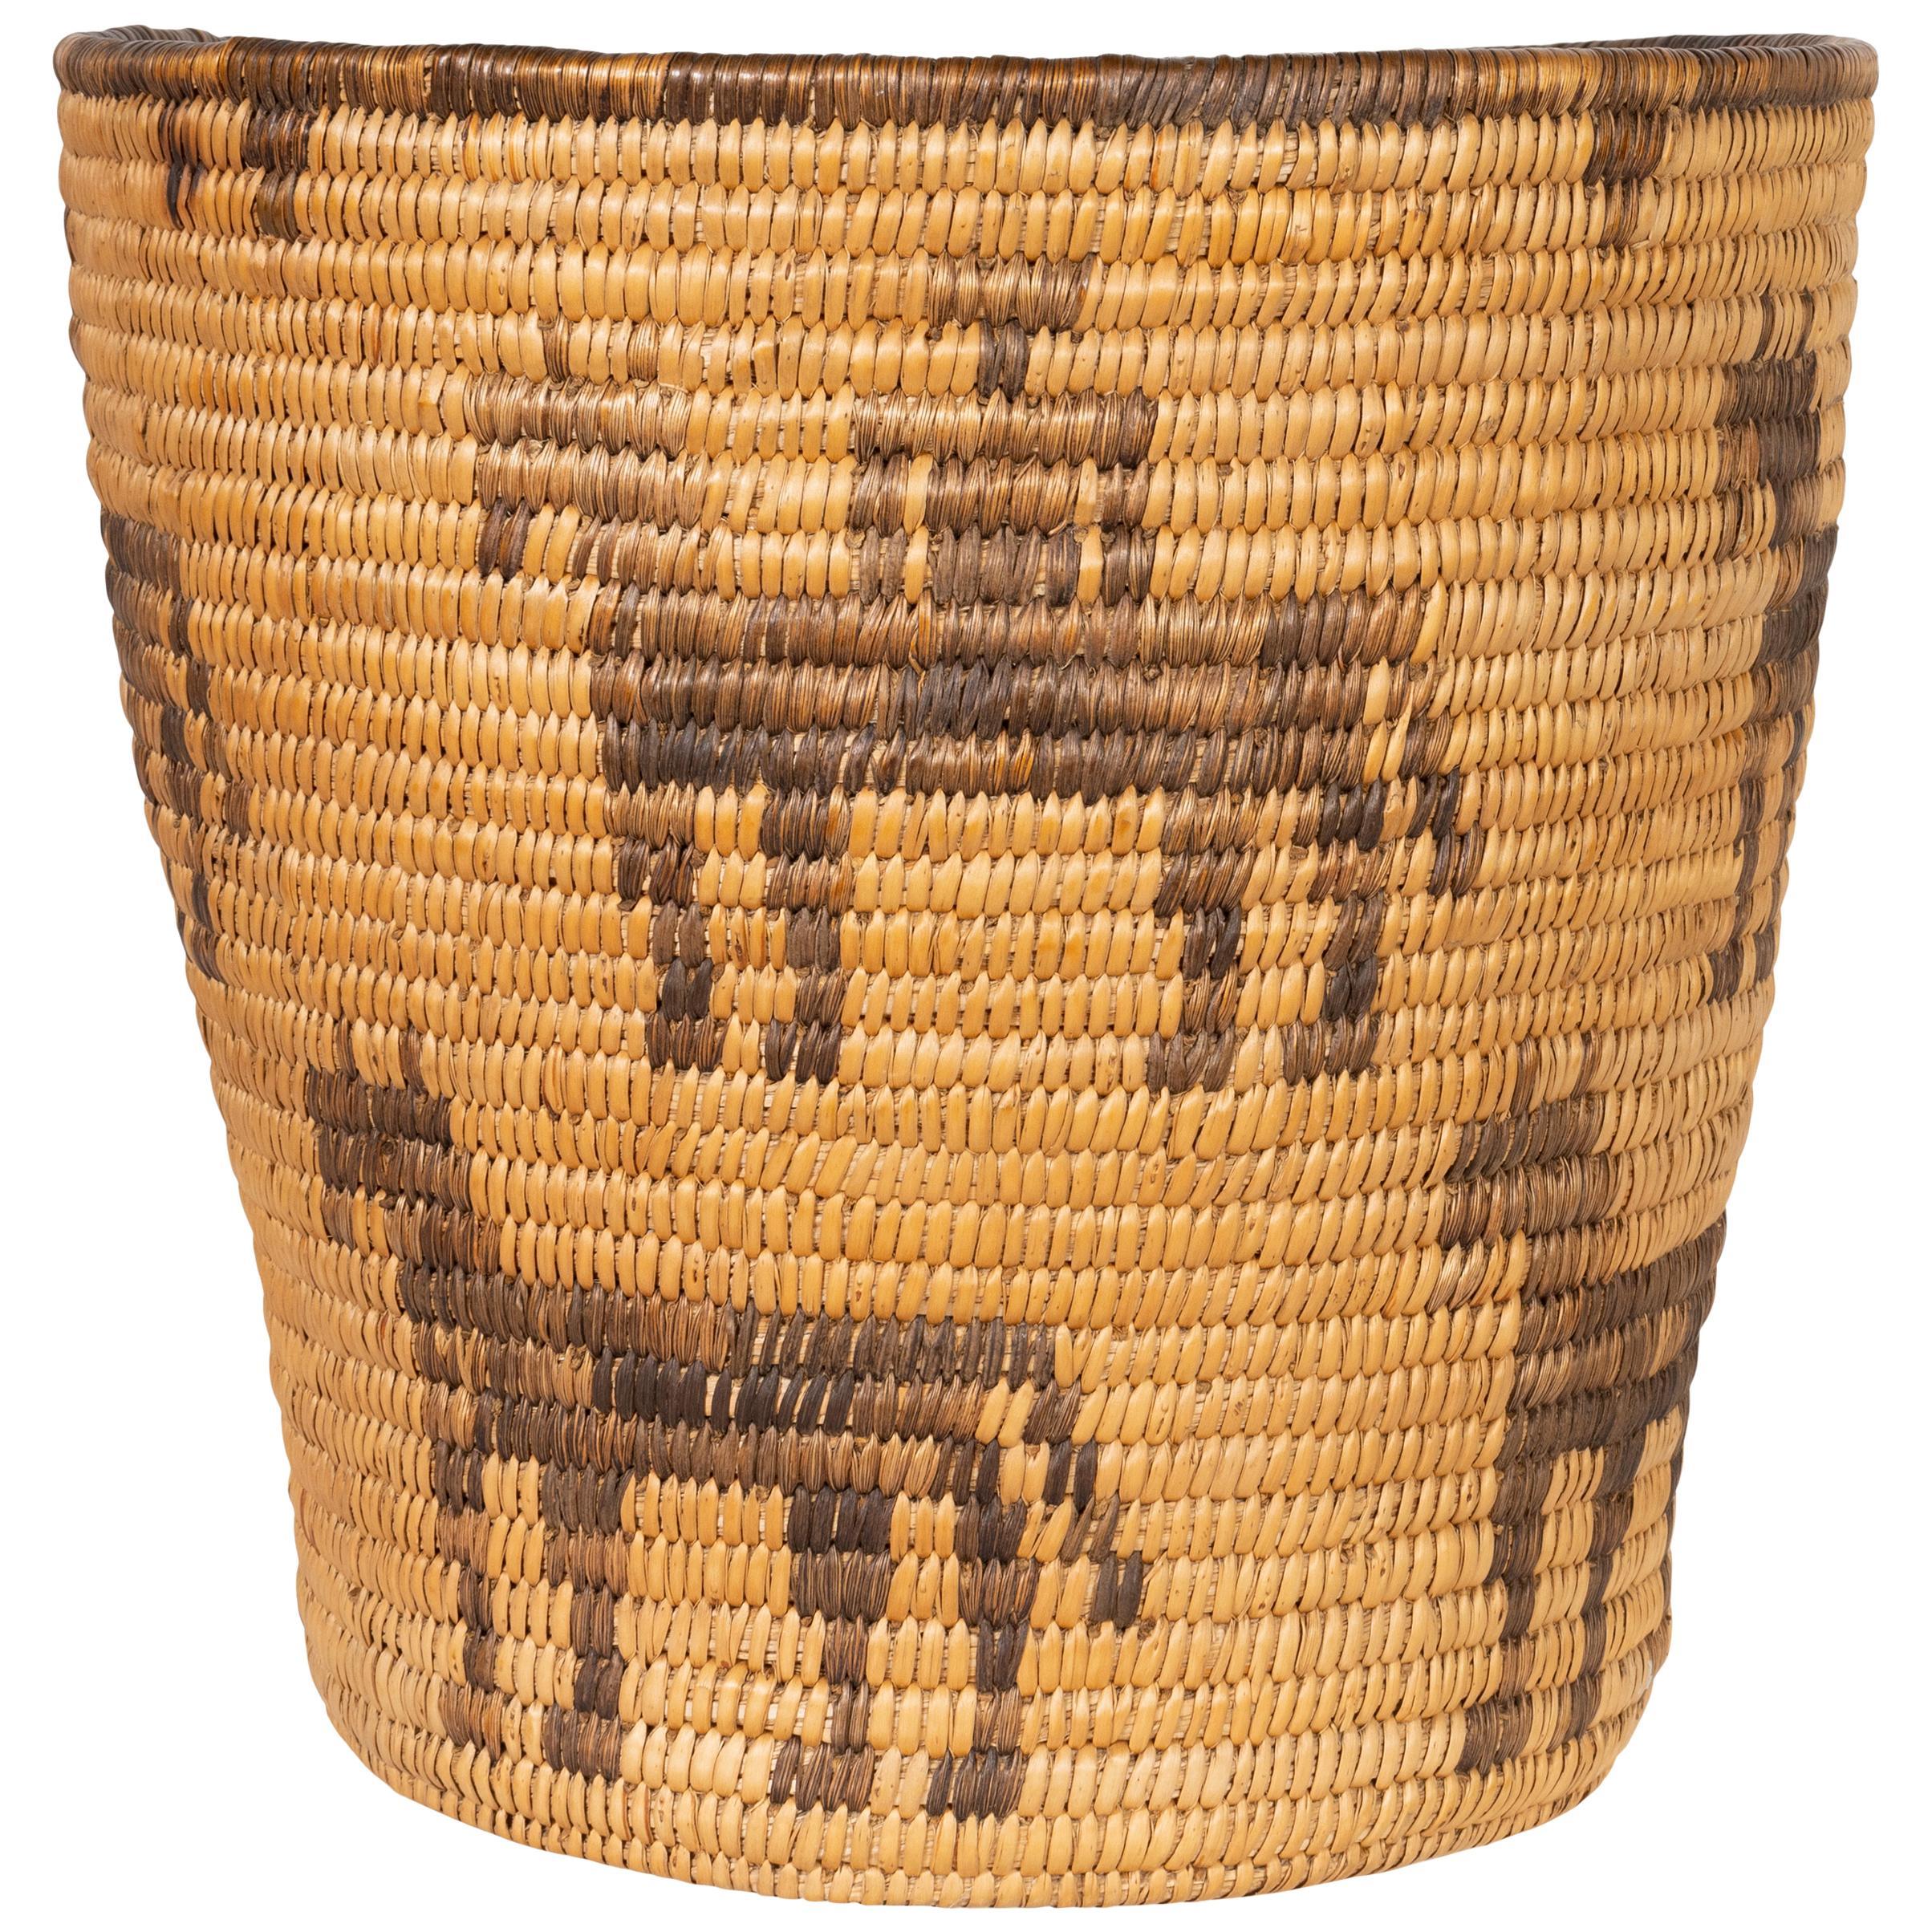 Pictorial 1920s Pima Basket